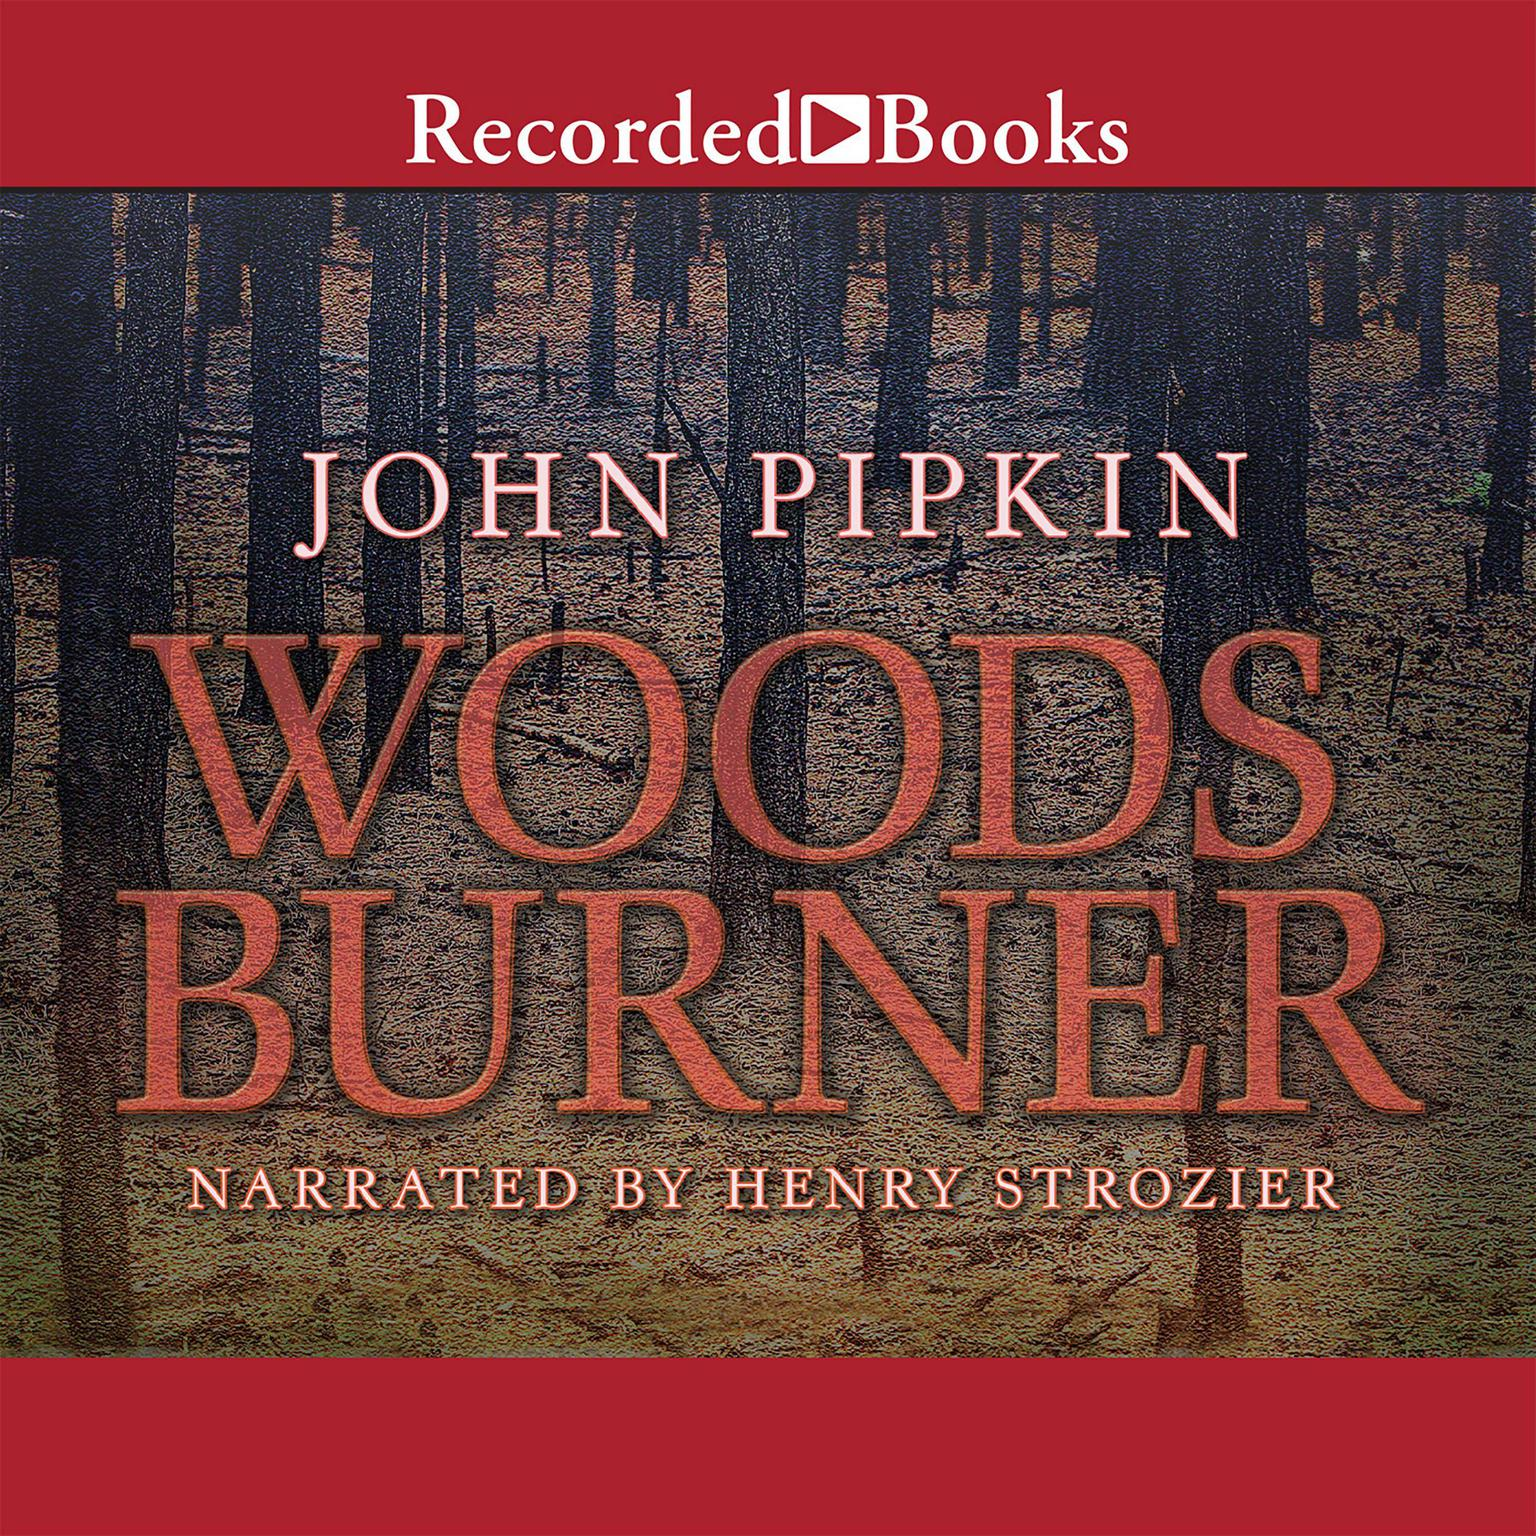 Printable Woodsburner: A Novel Audiobook Cover Art